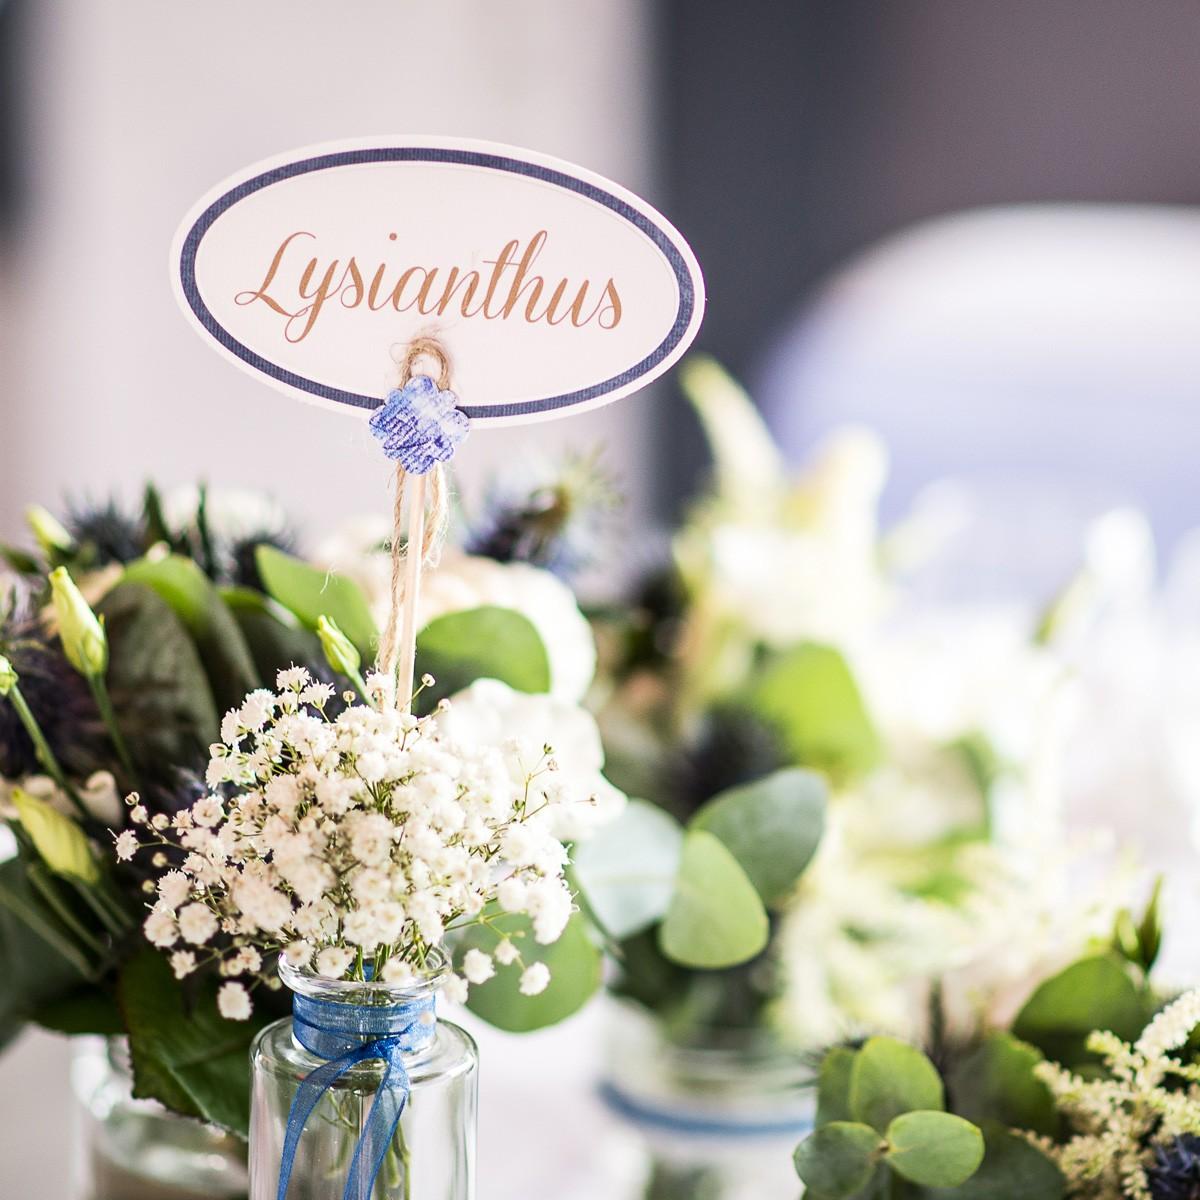 faire-part-mariage-bretagne-bleu-blanc-hortensia-papeterie-personnalisee-helene-ripoll-nom-table-fleur